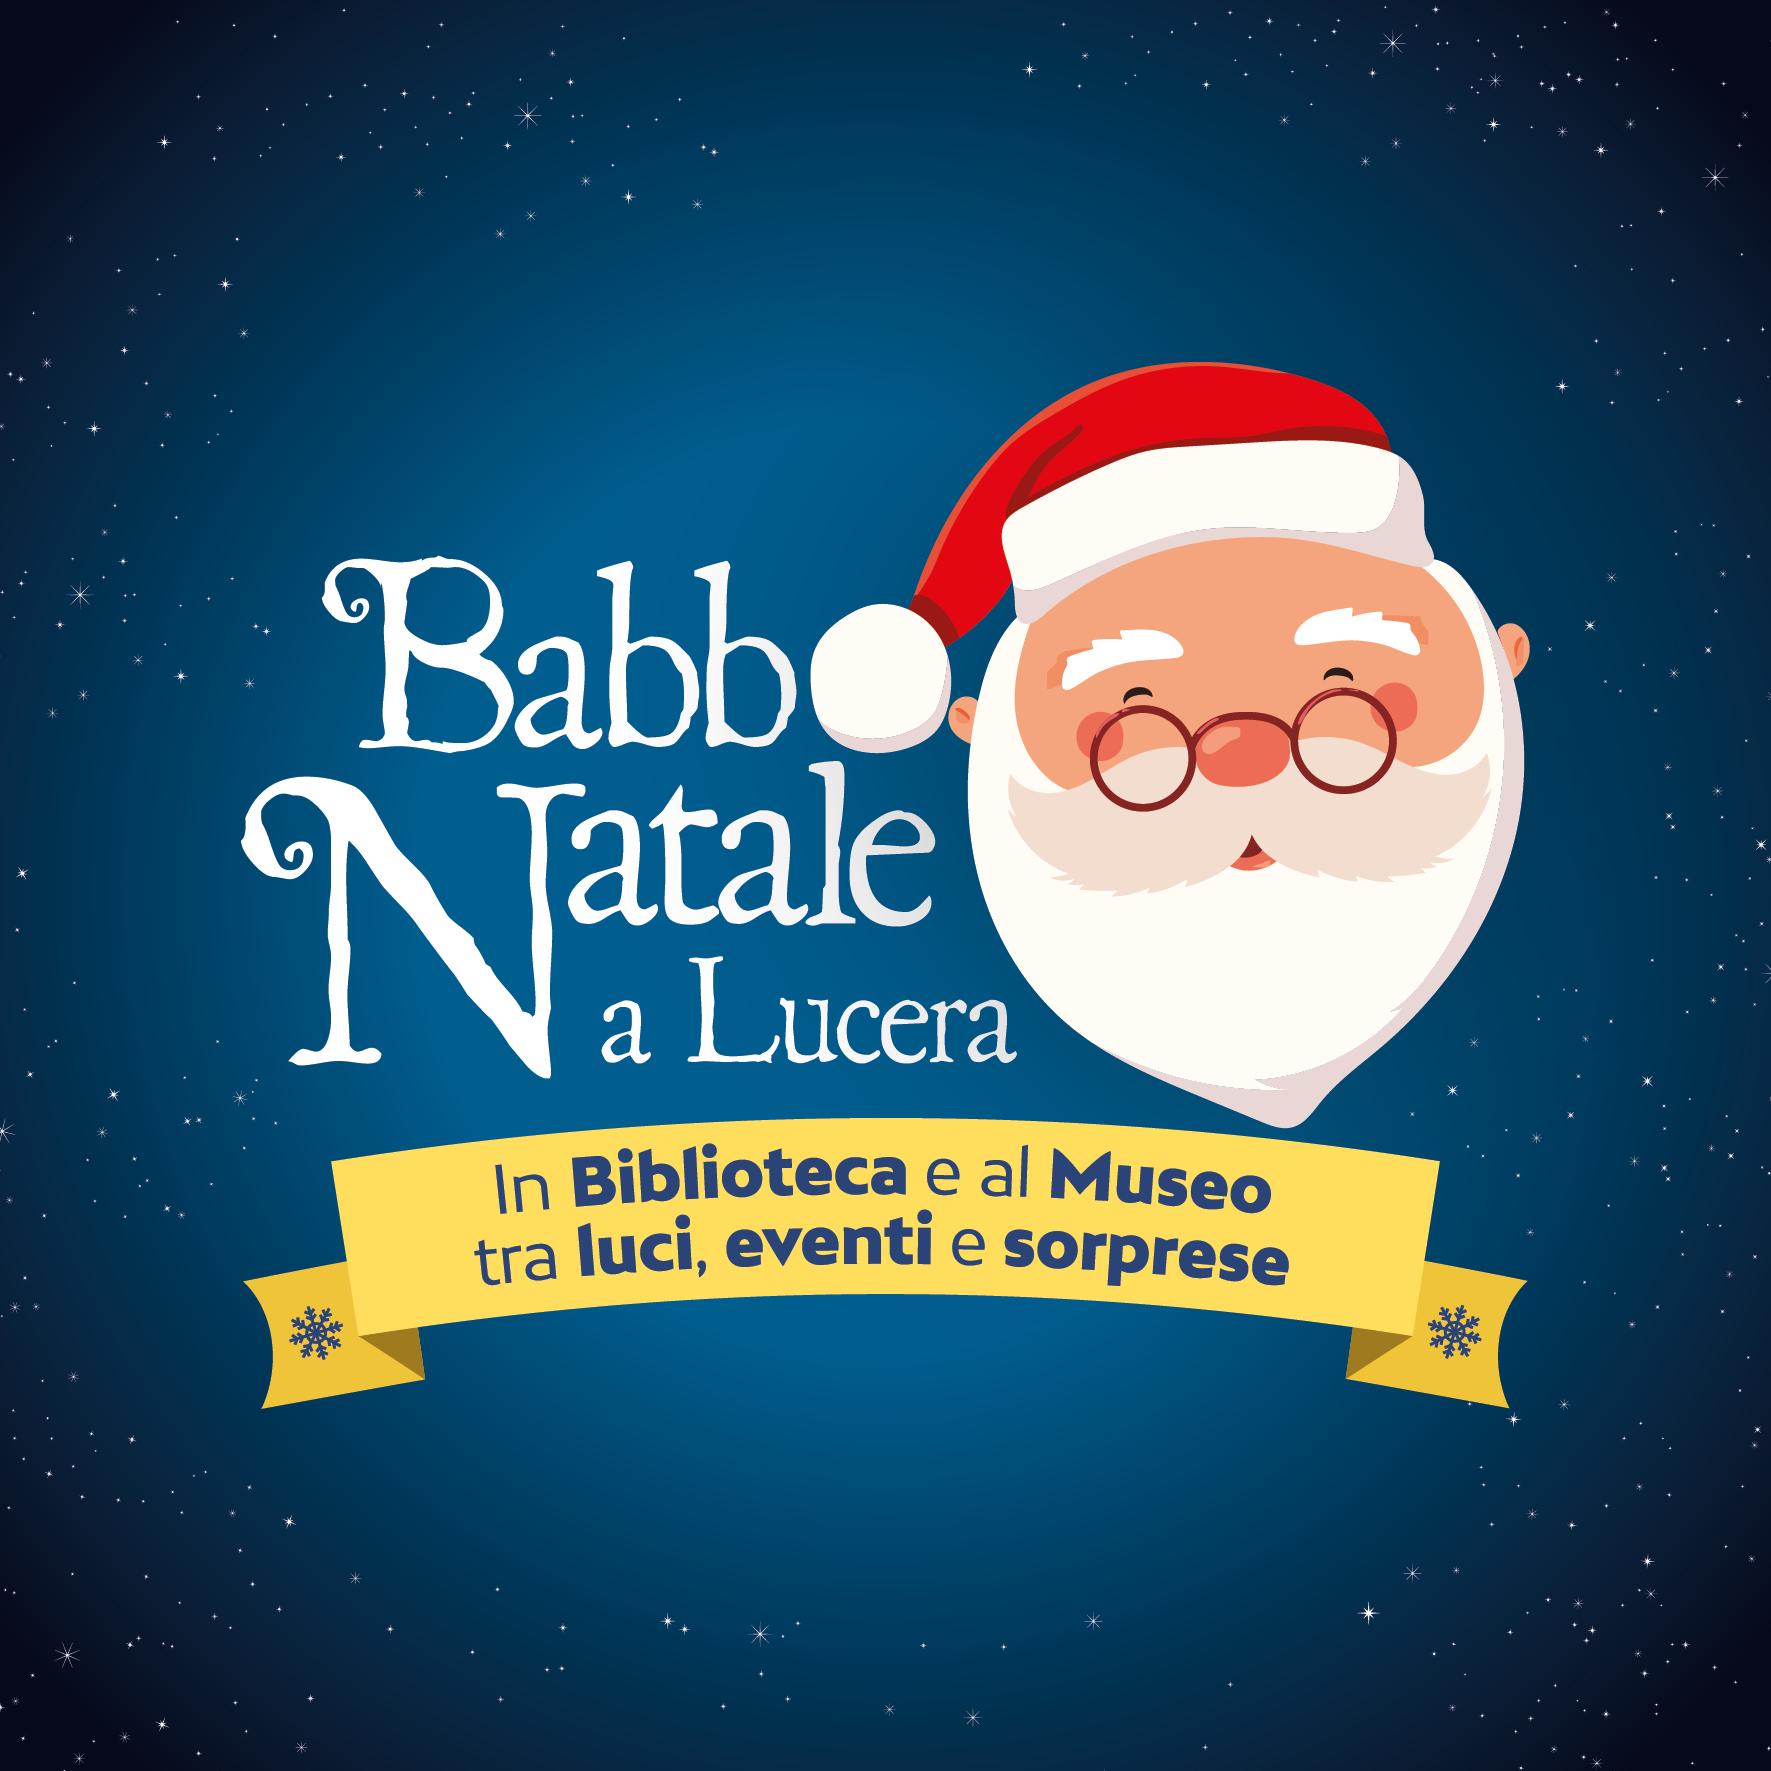 Babbo Natale a Lucera